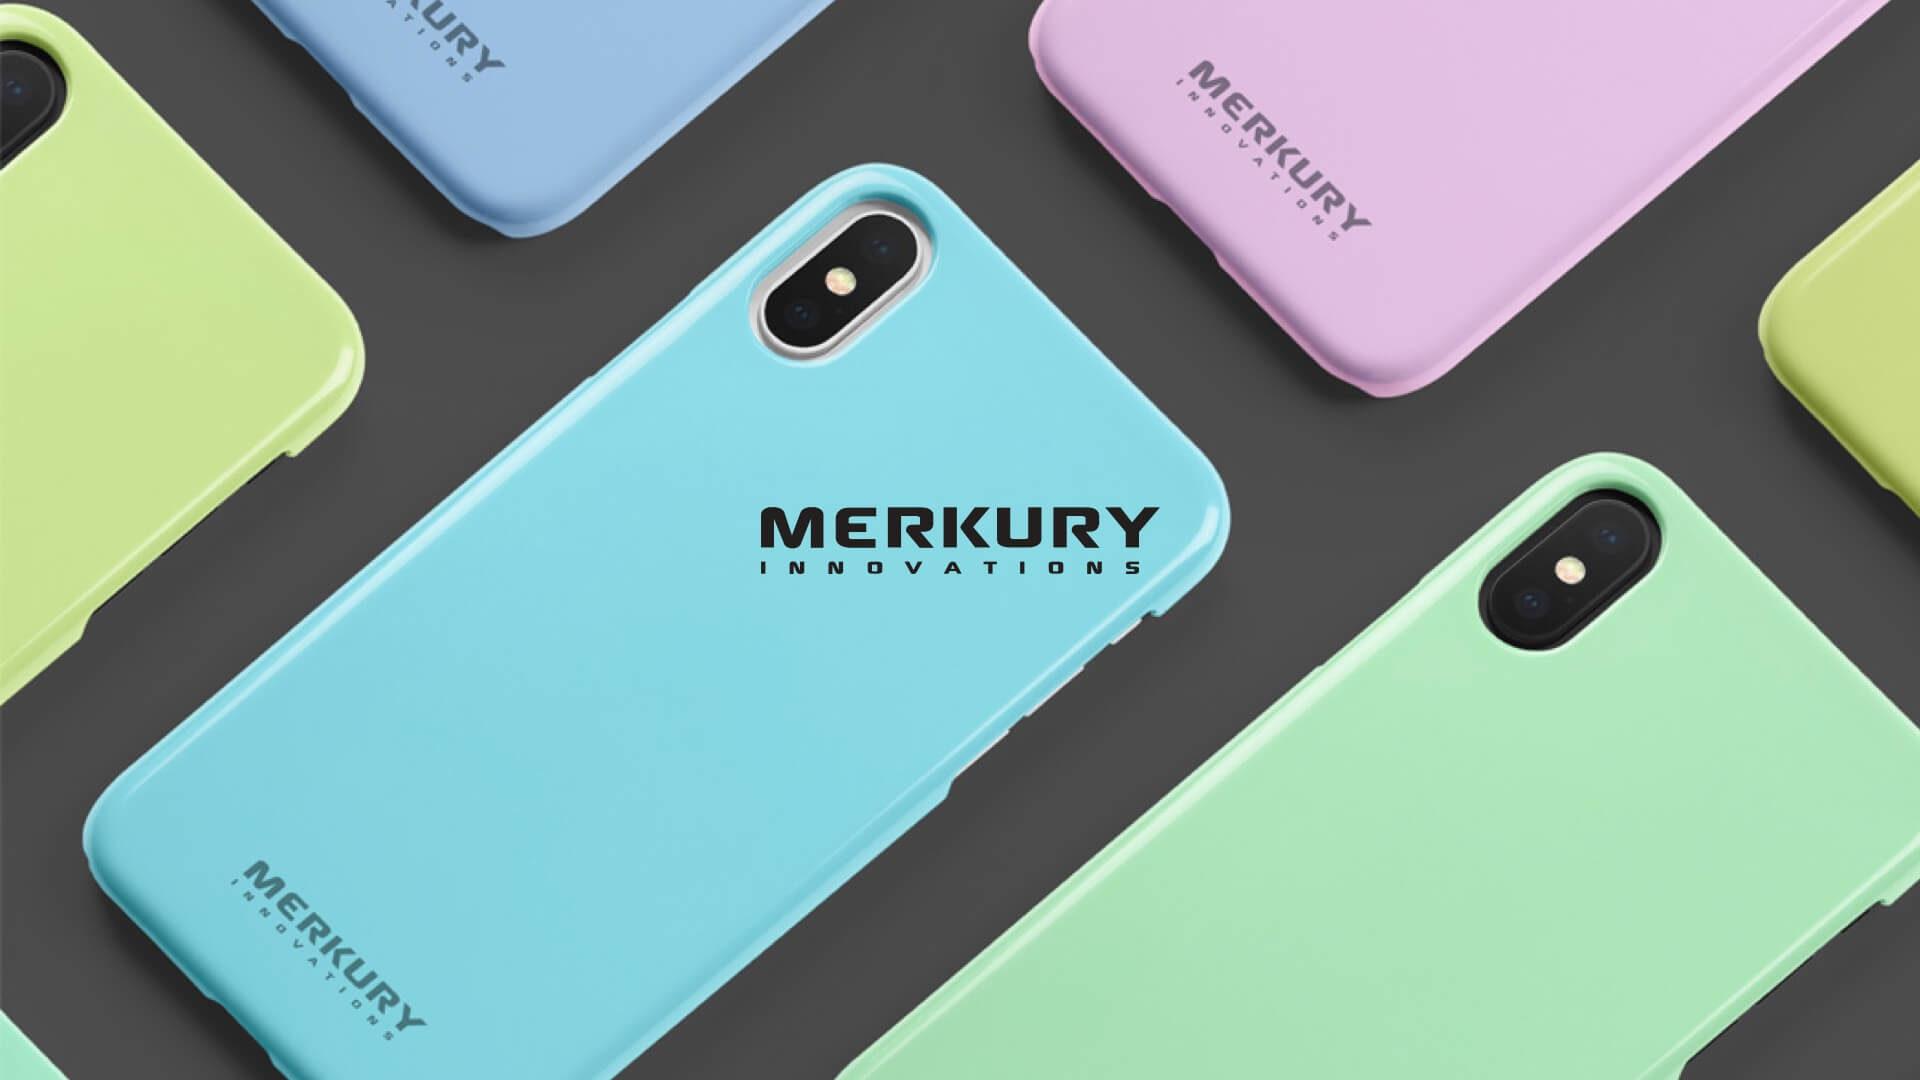 Merkury Innovations Website Design and Development